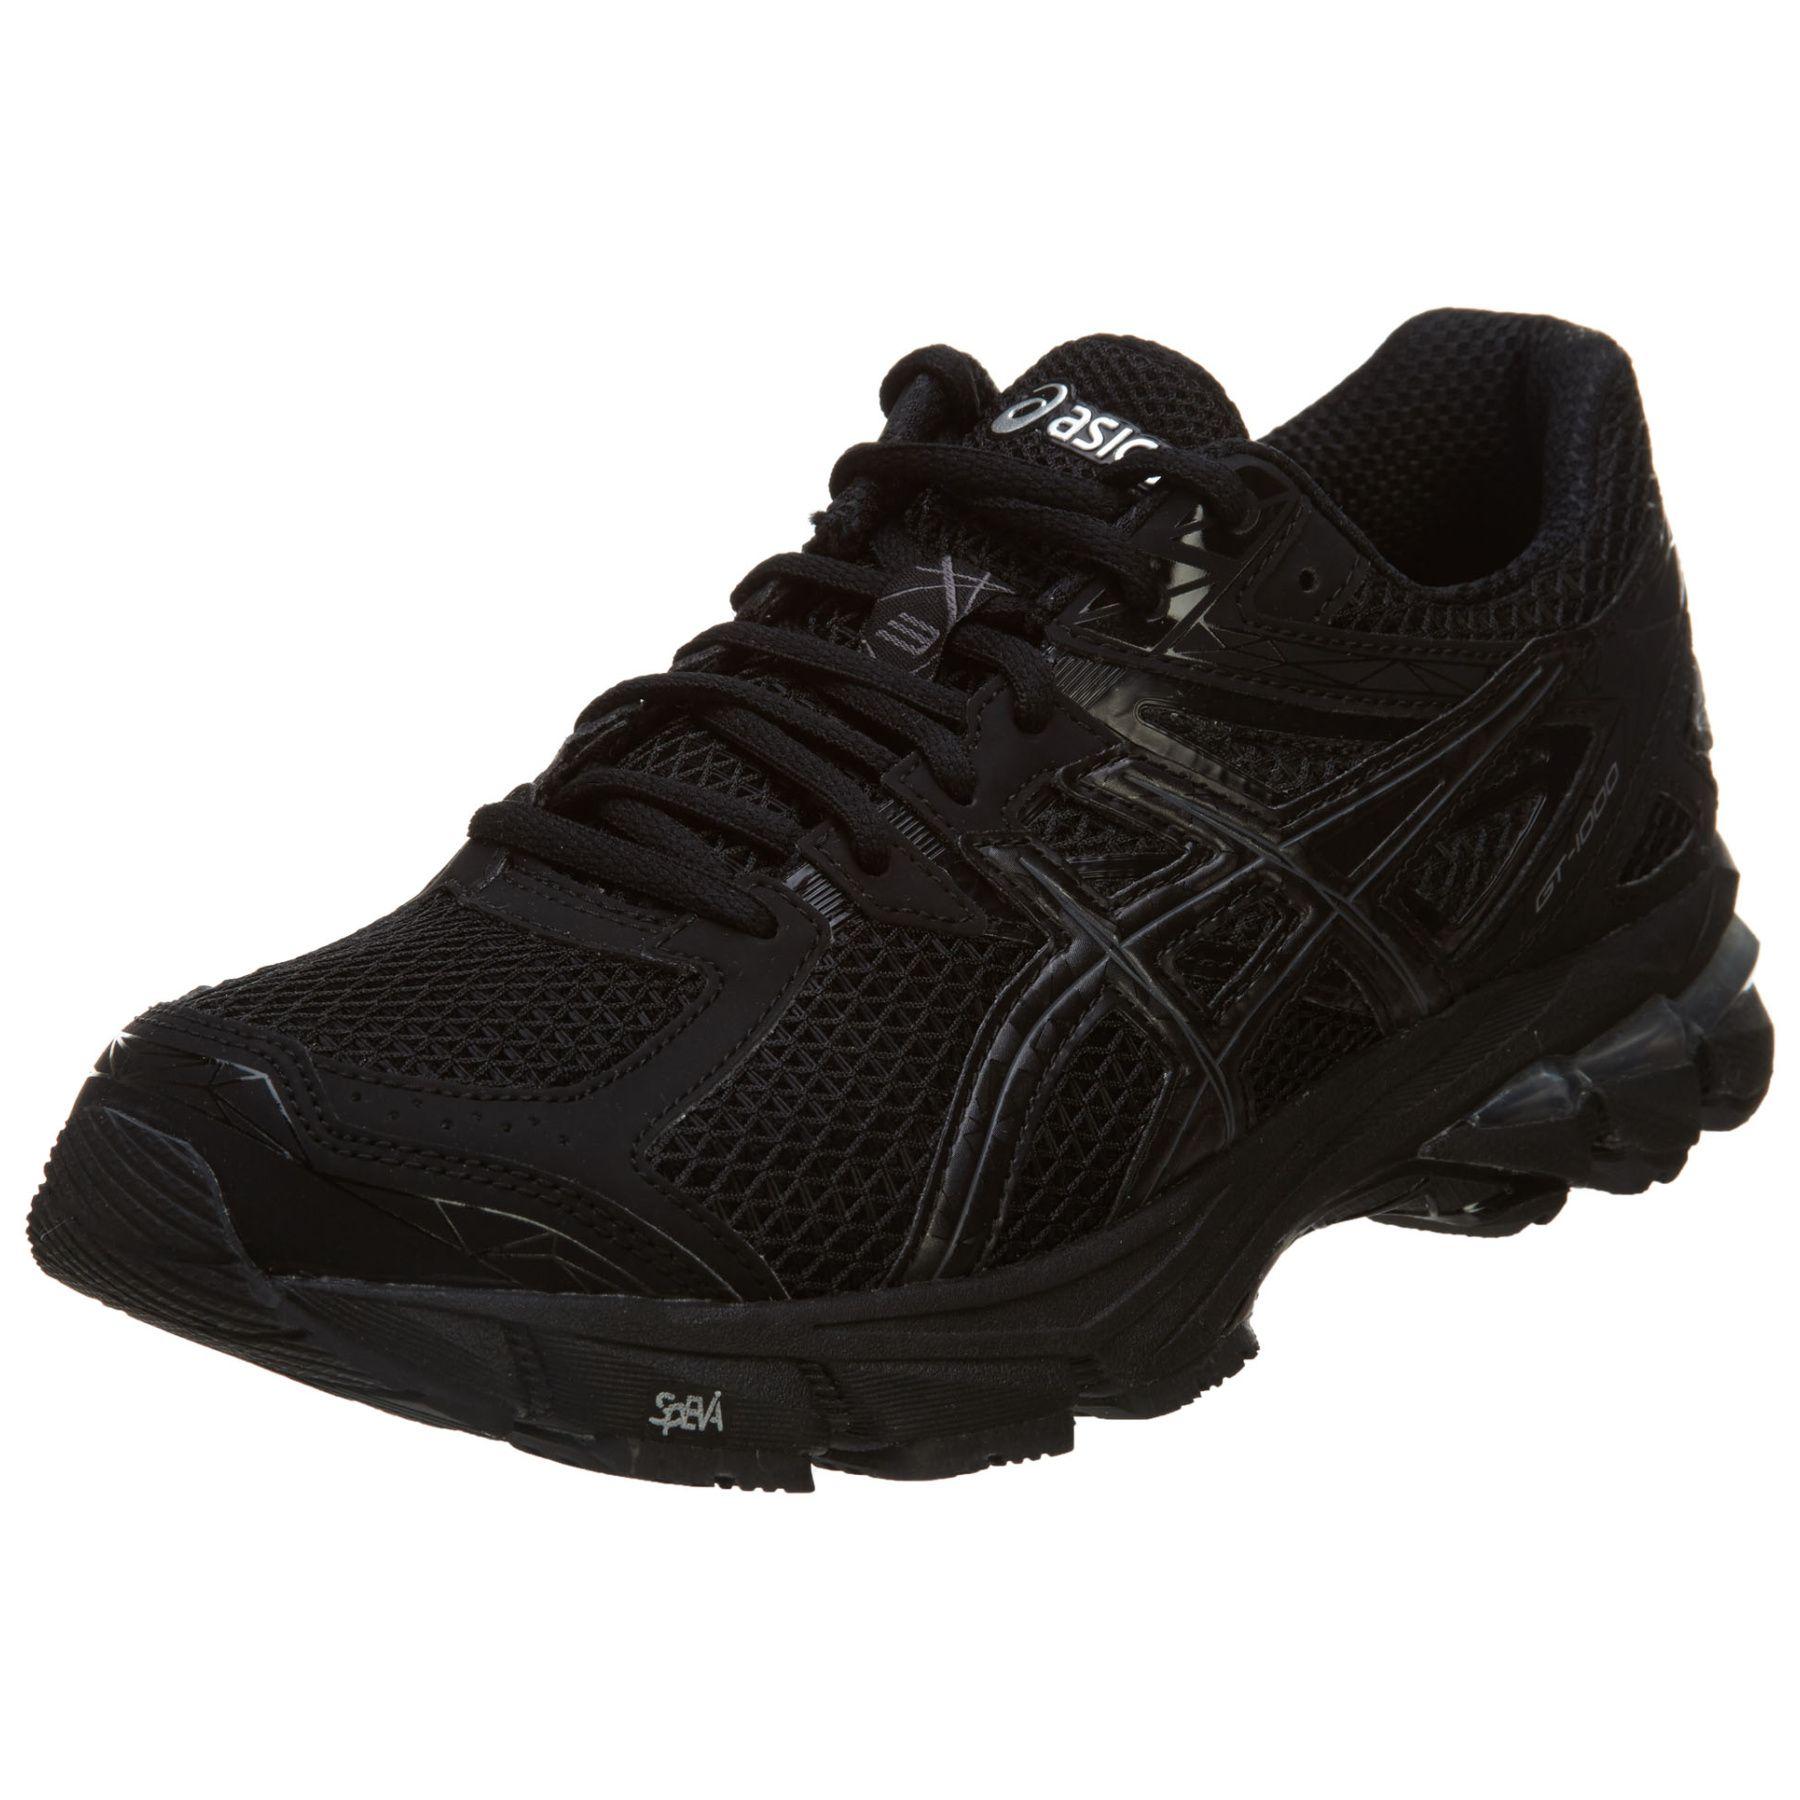 Asics Gt-1000 3 Womens Style: T4k8n-9099 Size: 8 M Us · Black Running  ShoesAsics ...